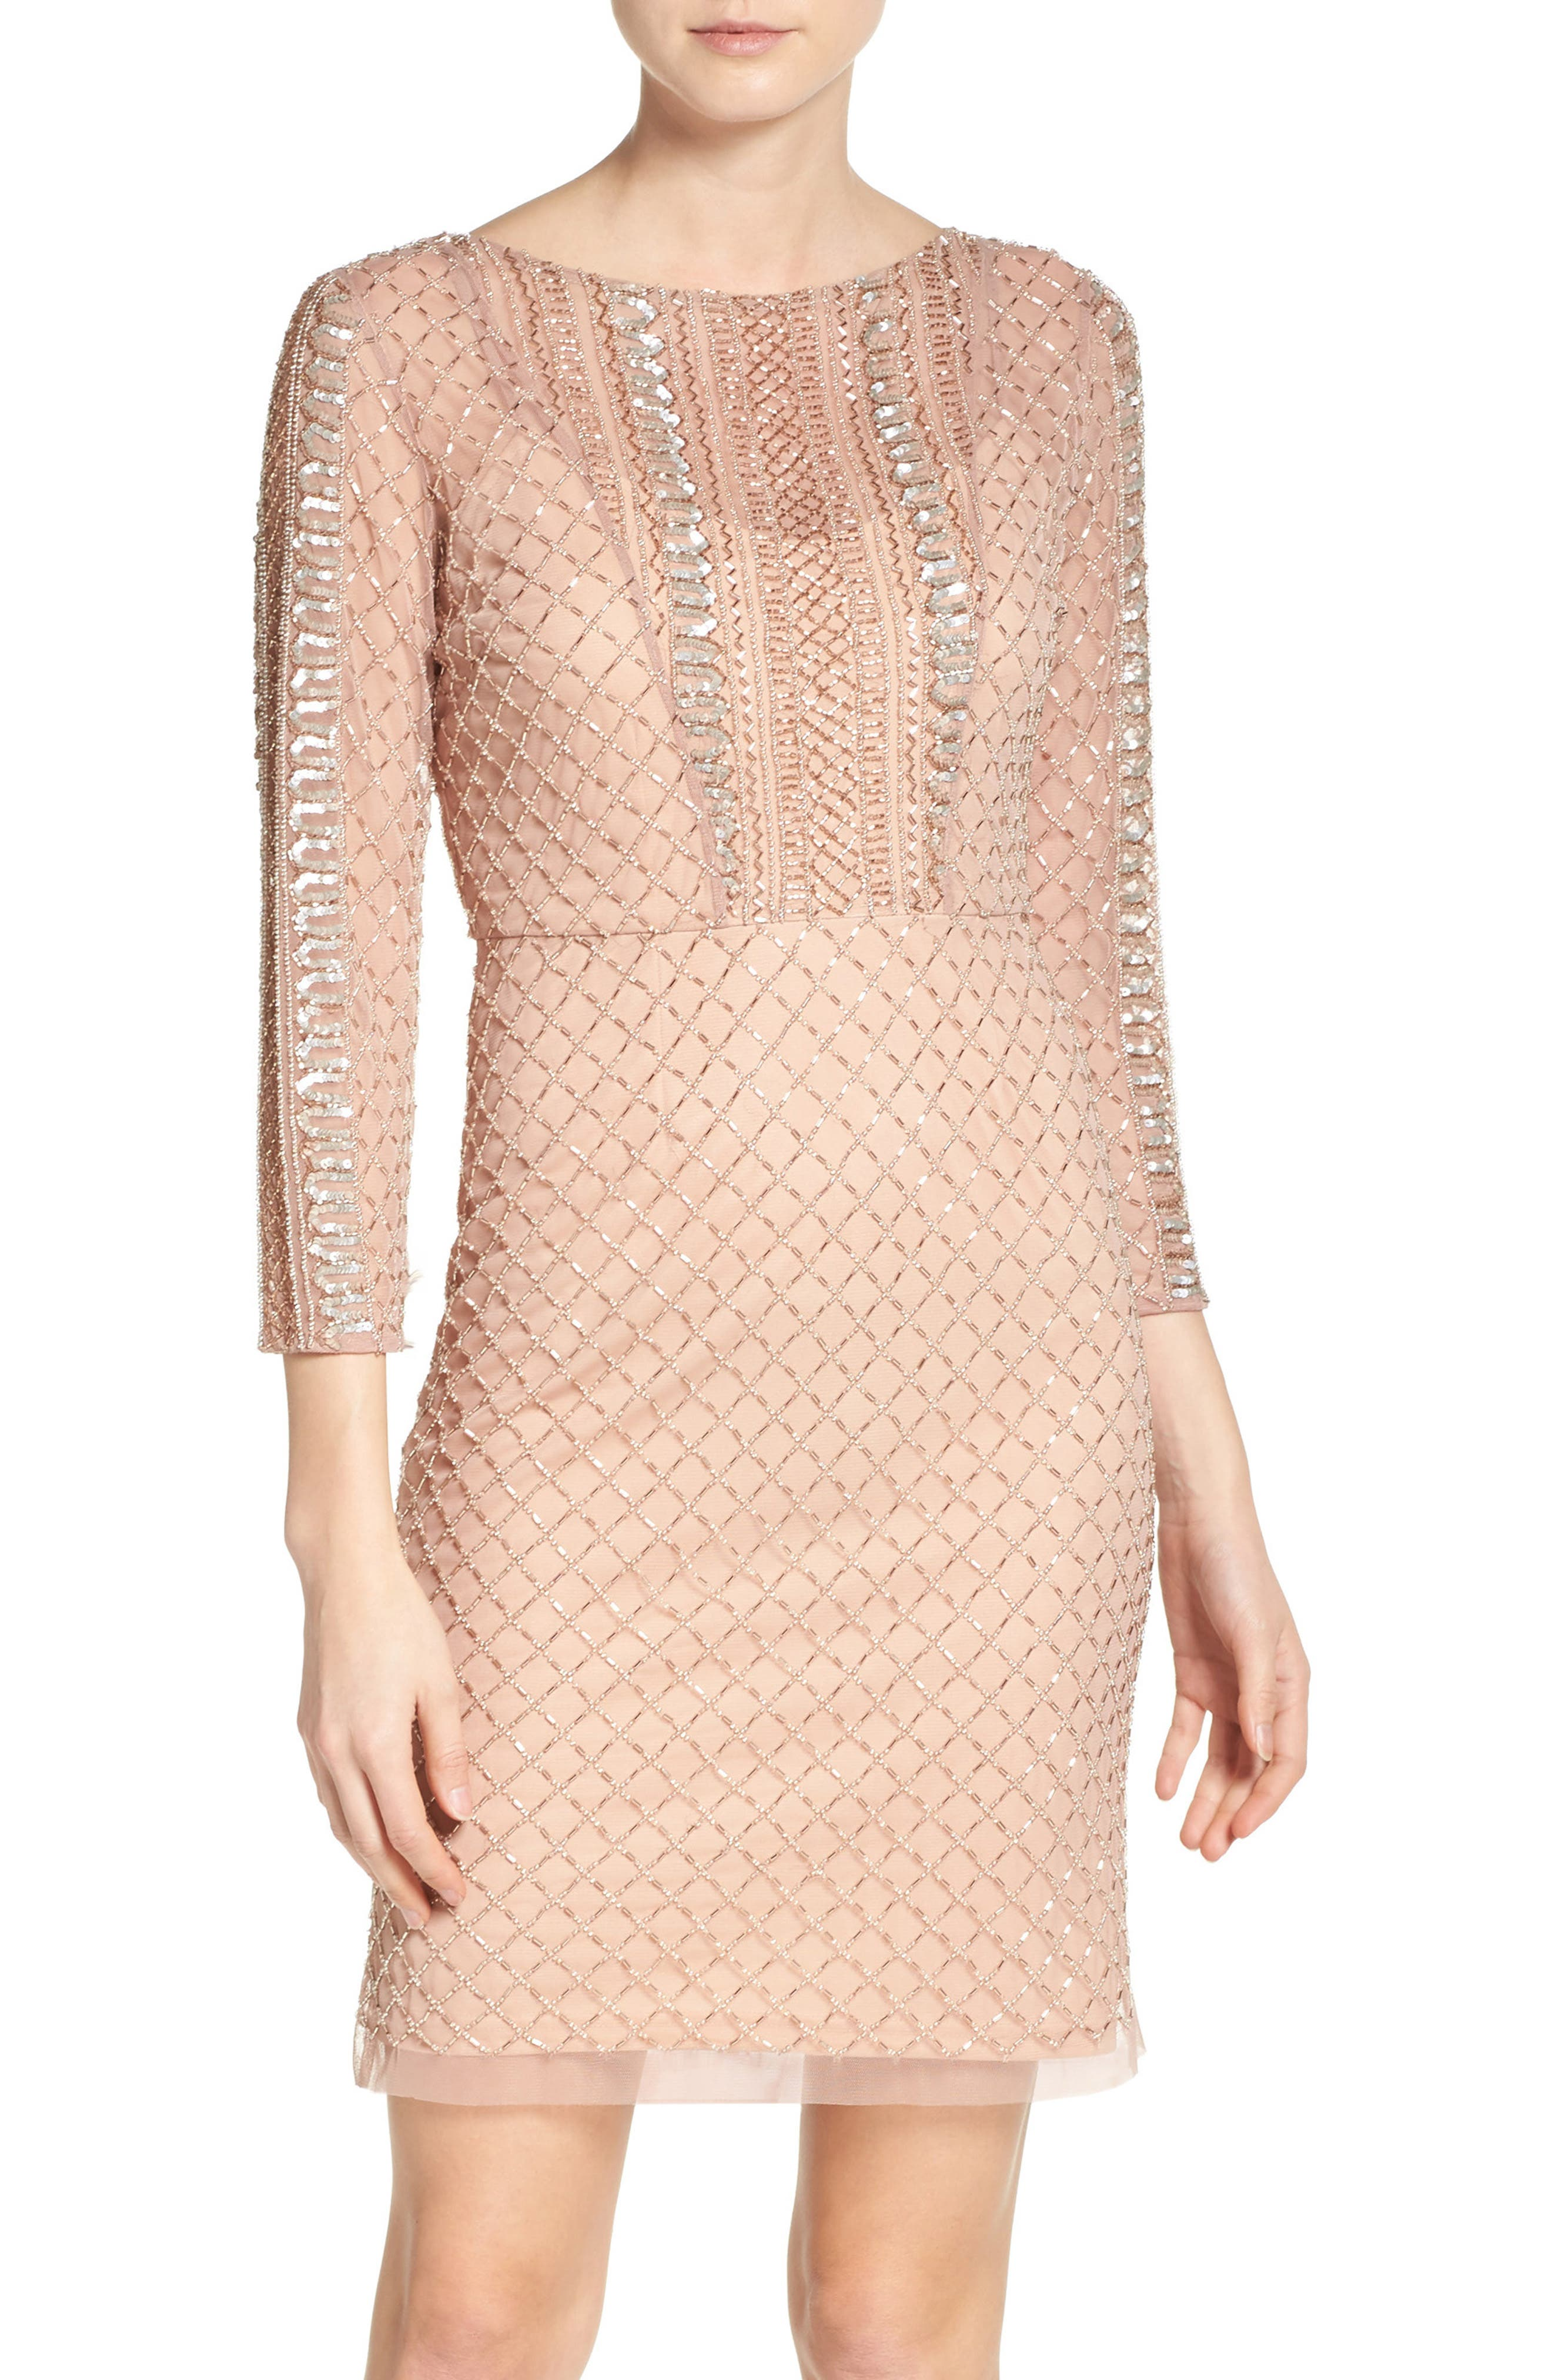 Alternate Image 1 Selected - Adrianna Papell Sheath Dress